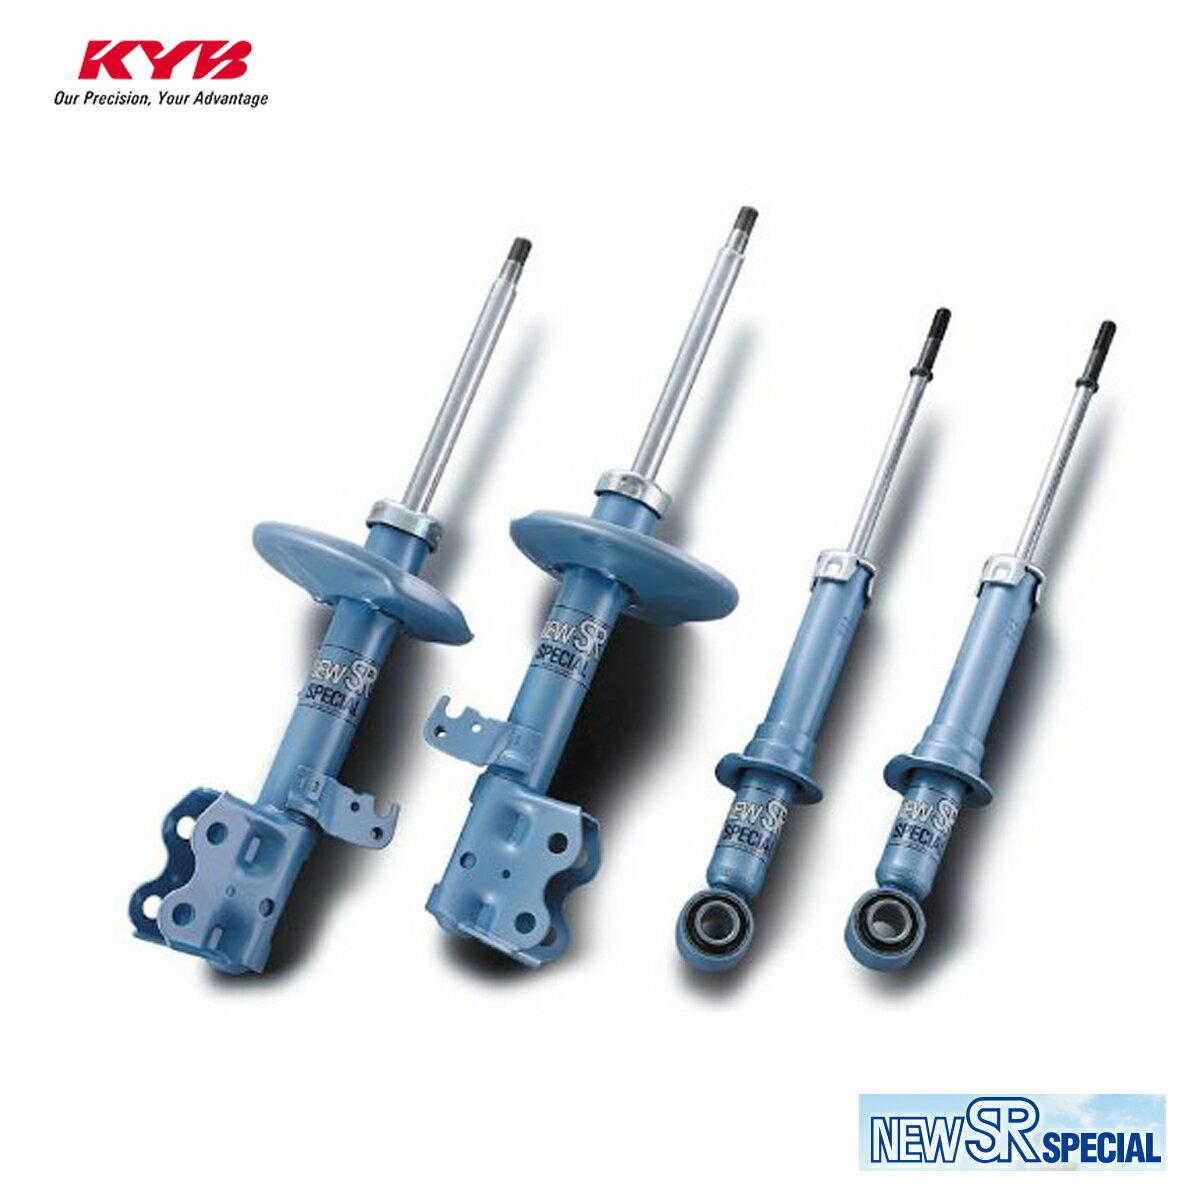 KYB カヤバ ローレル SC34 ショックアブソーバー フロント 右用 1本 NEW SR SPECIAL NST5107R 配送先条件有り